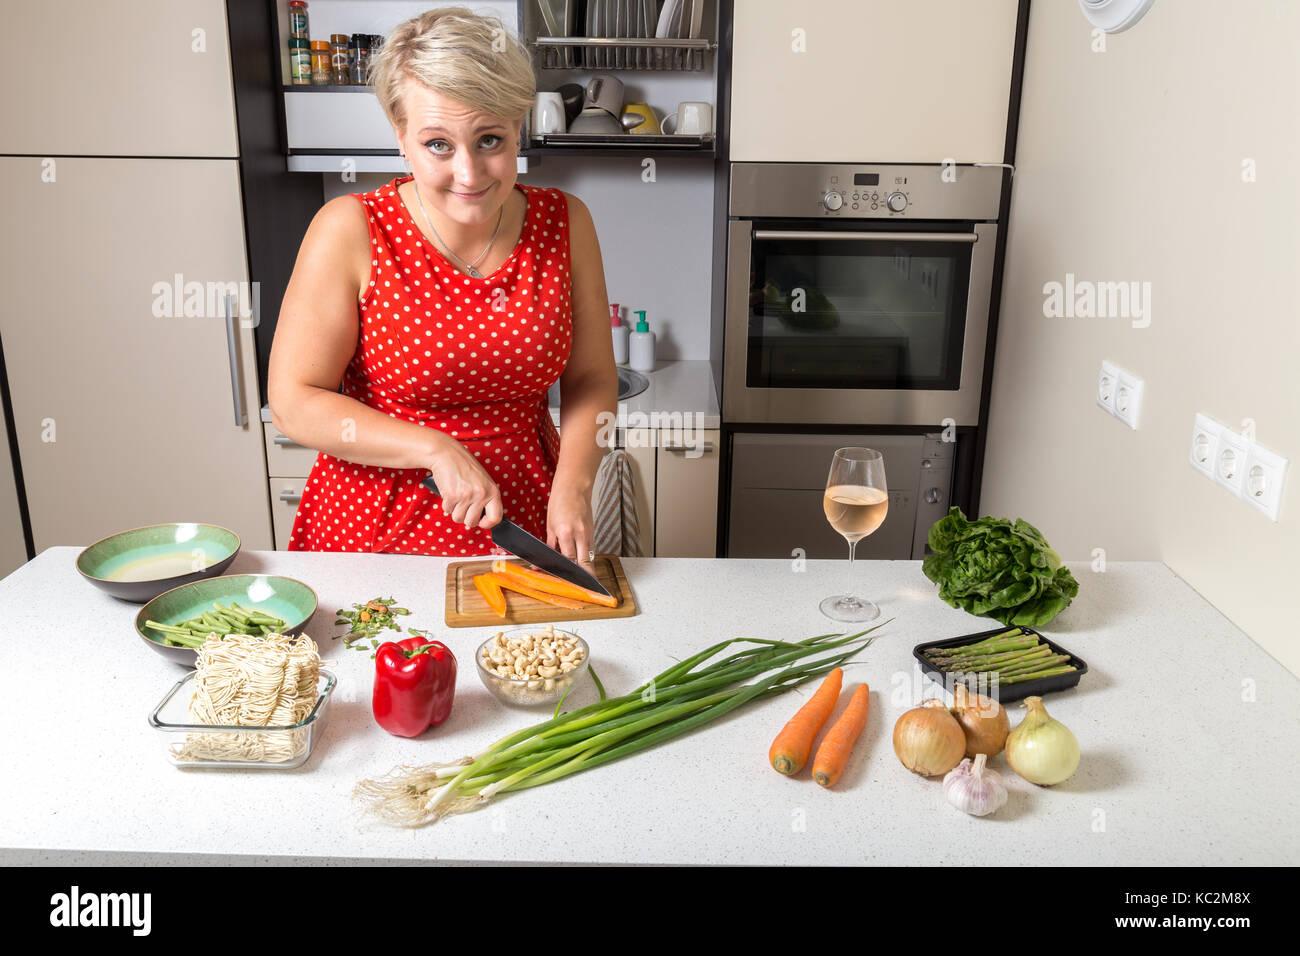 Girl smiling at camera and preparing food - Stock Image